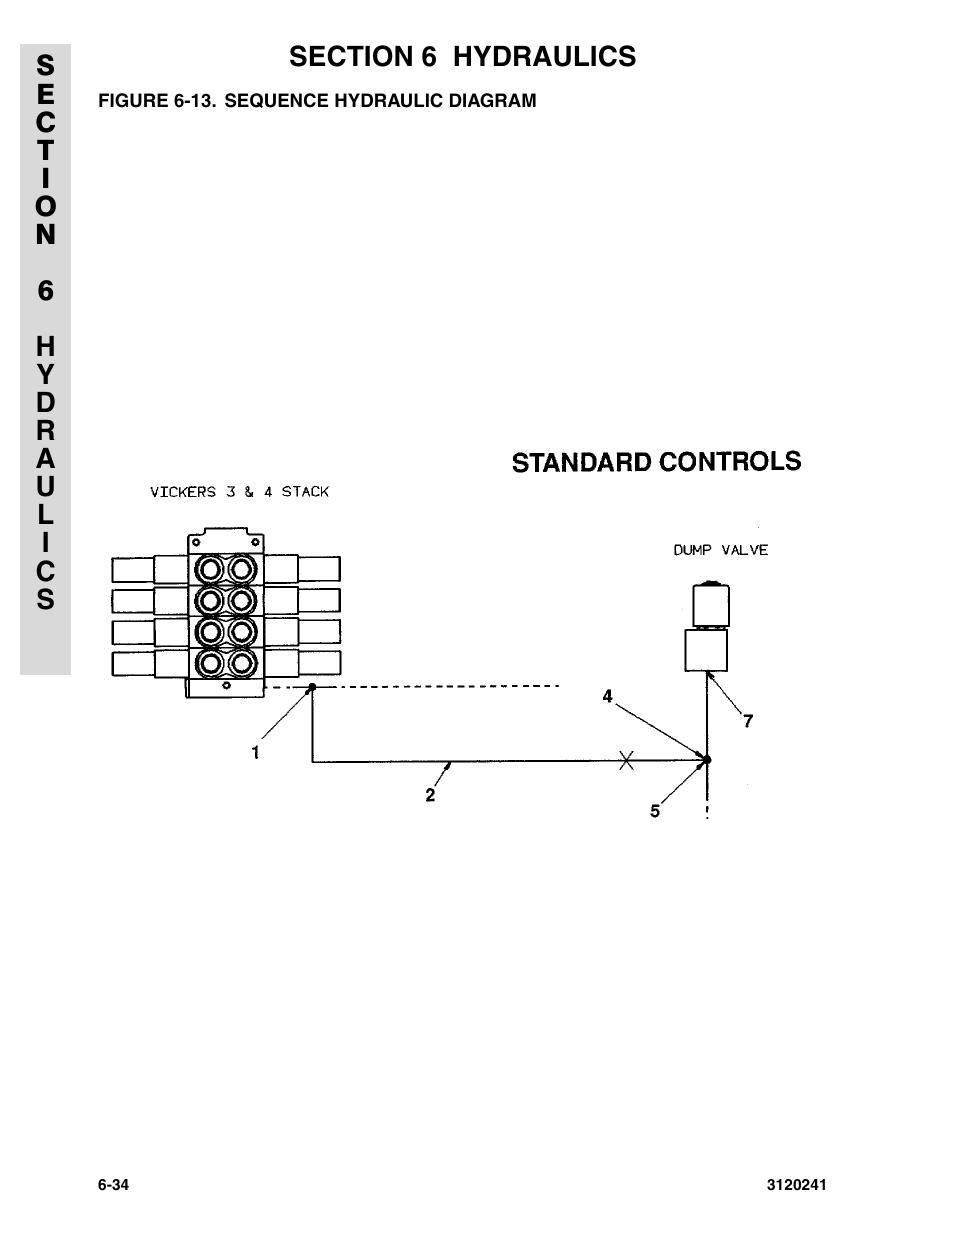 figure 6 13 sequence hydraulic diagram jlg 40h parts. Black Bedroom Furniture Sets. Home Design Ideas